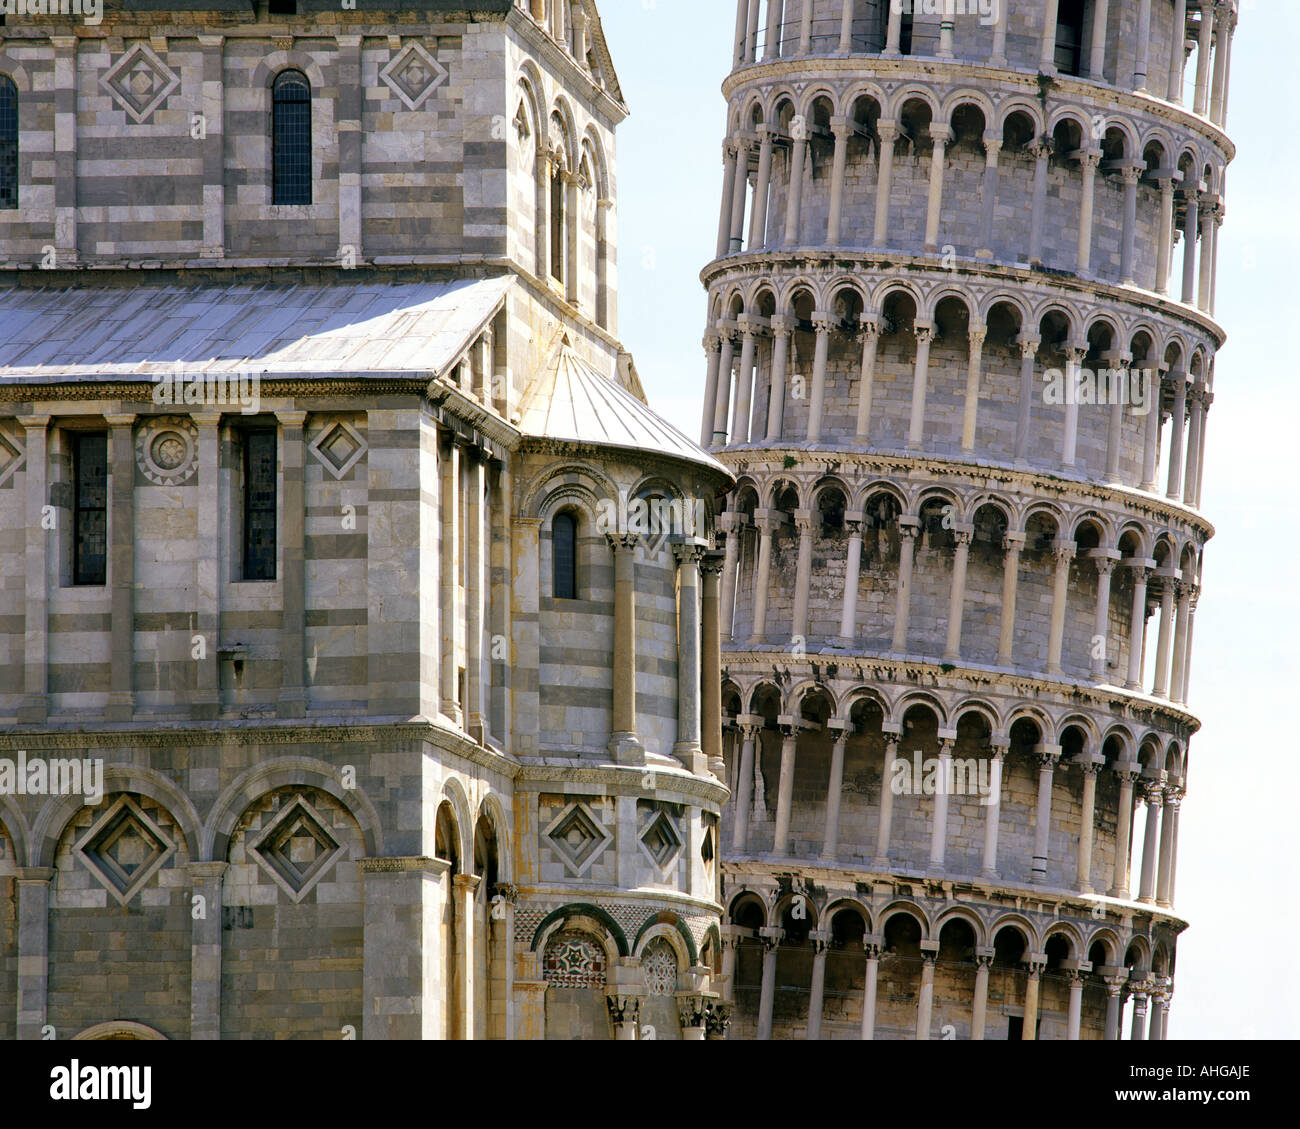 ES - TUSCANY: Schiefe Turm von Pisa Stockbild